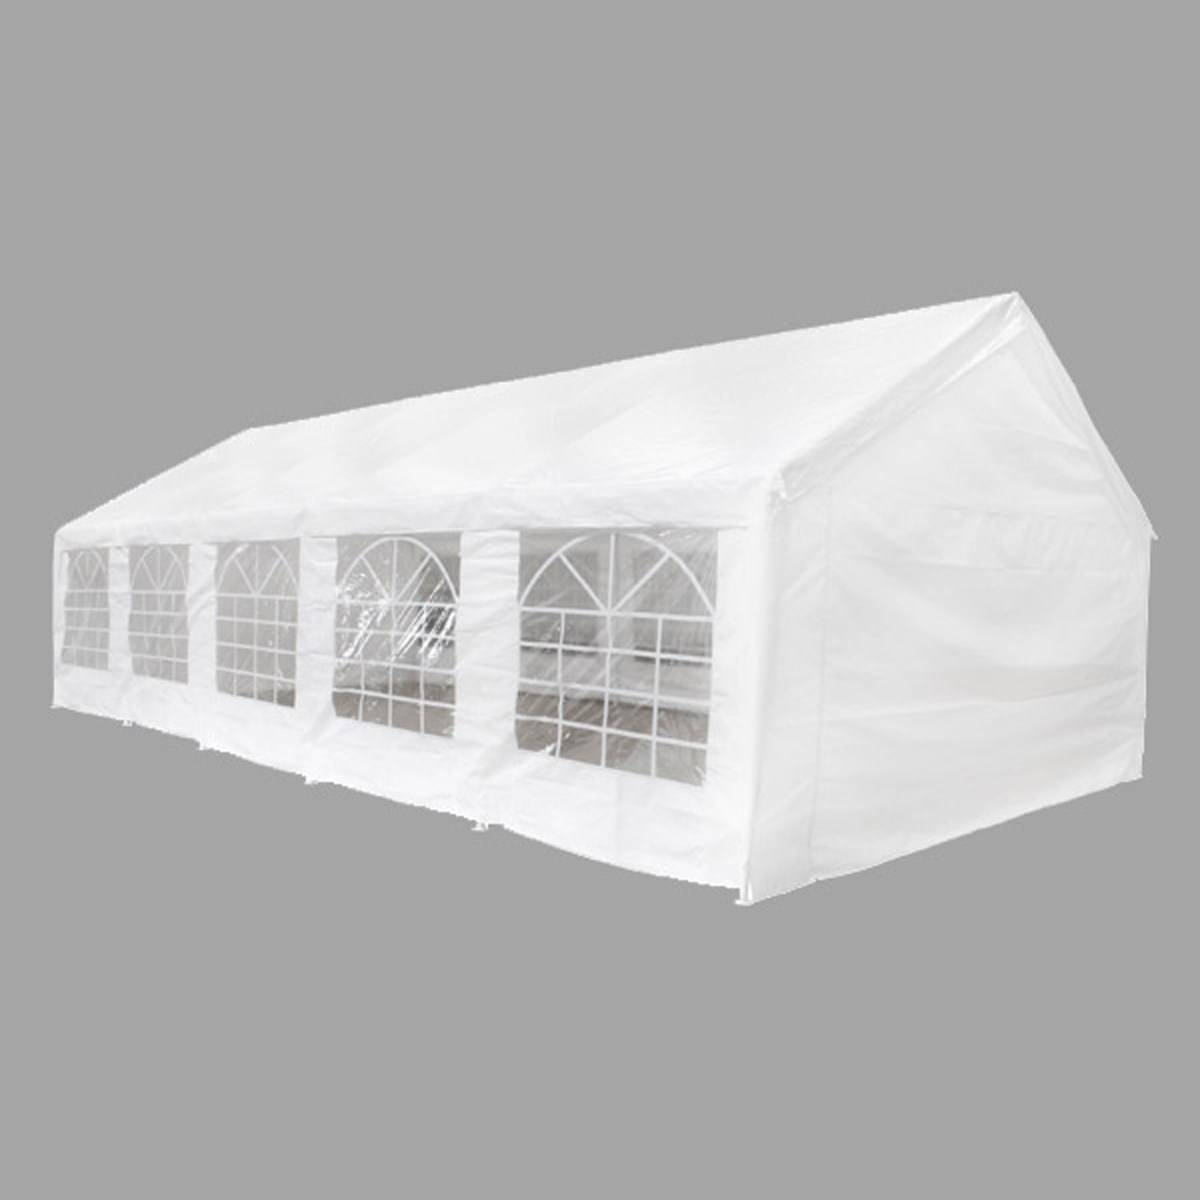 Zelt 10 Meter : Zelt festzelt partyzelt pavillon meter weiss